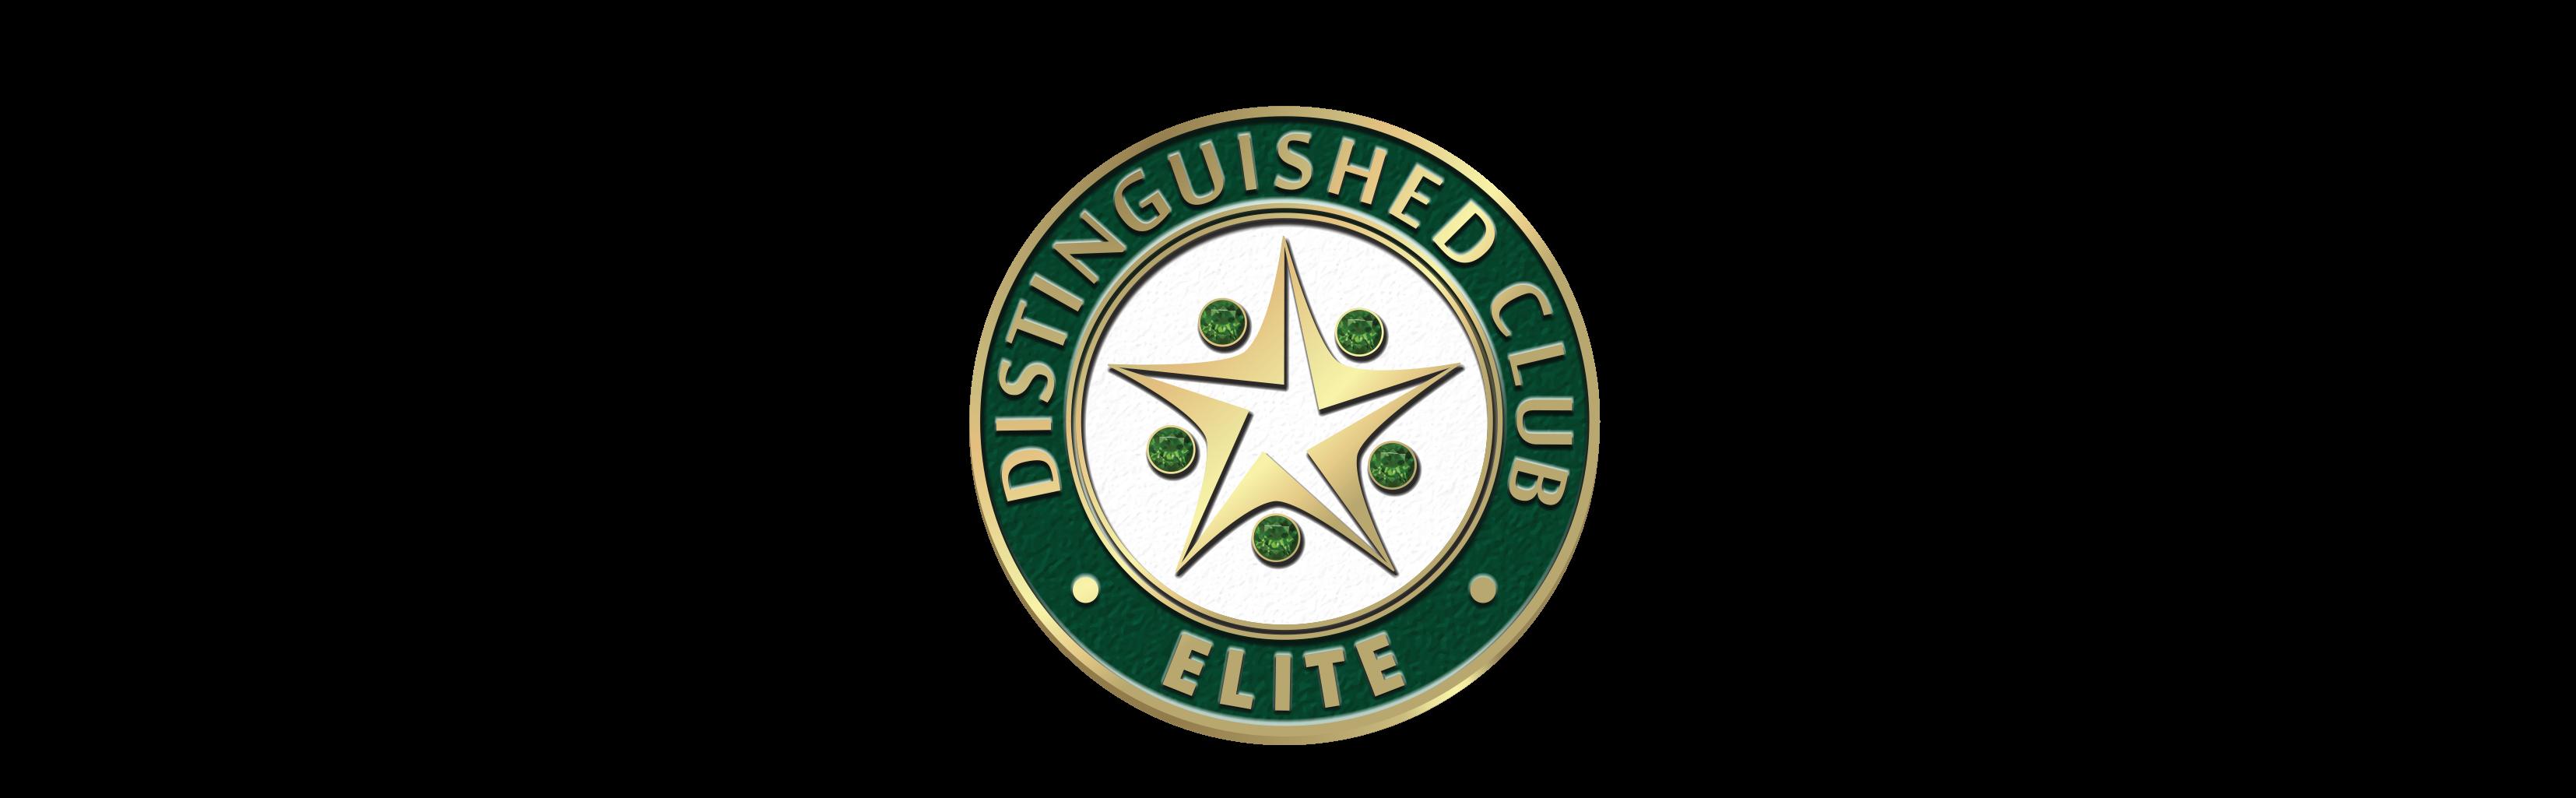 BHYC is Awarded the Elite Distinguished Club Designation